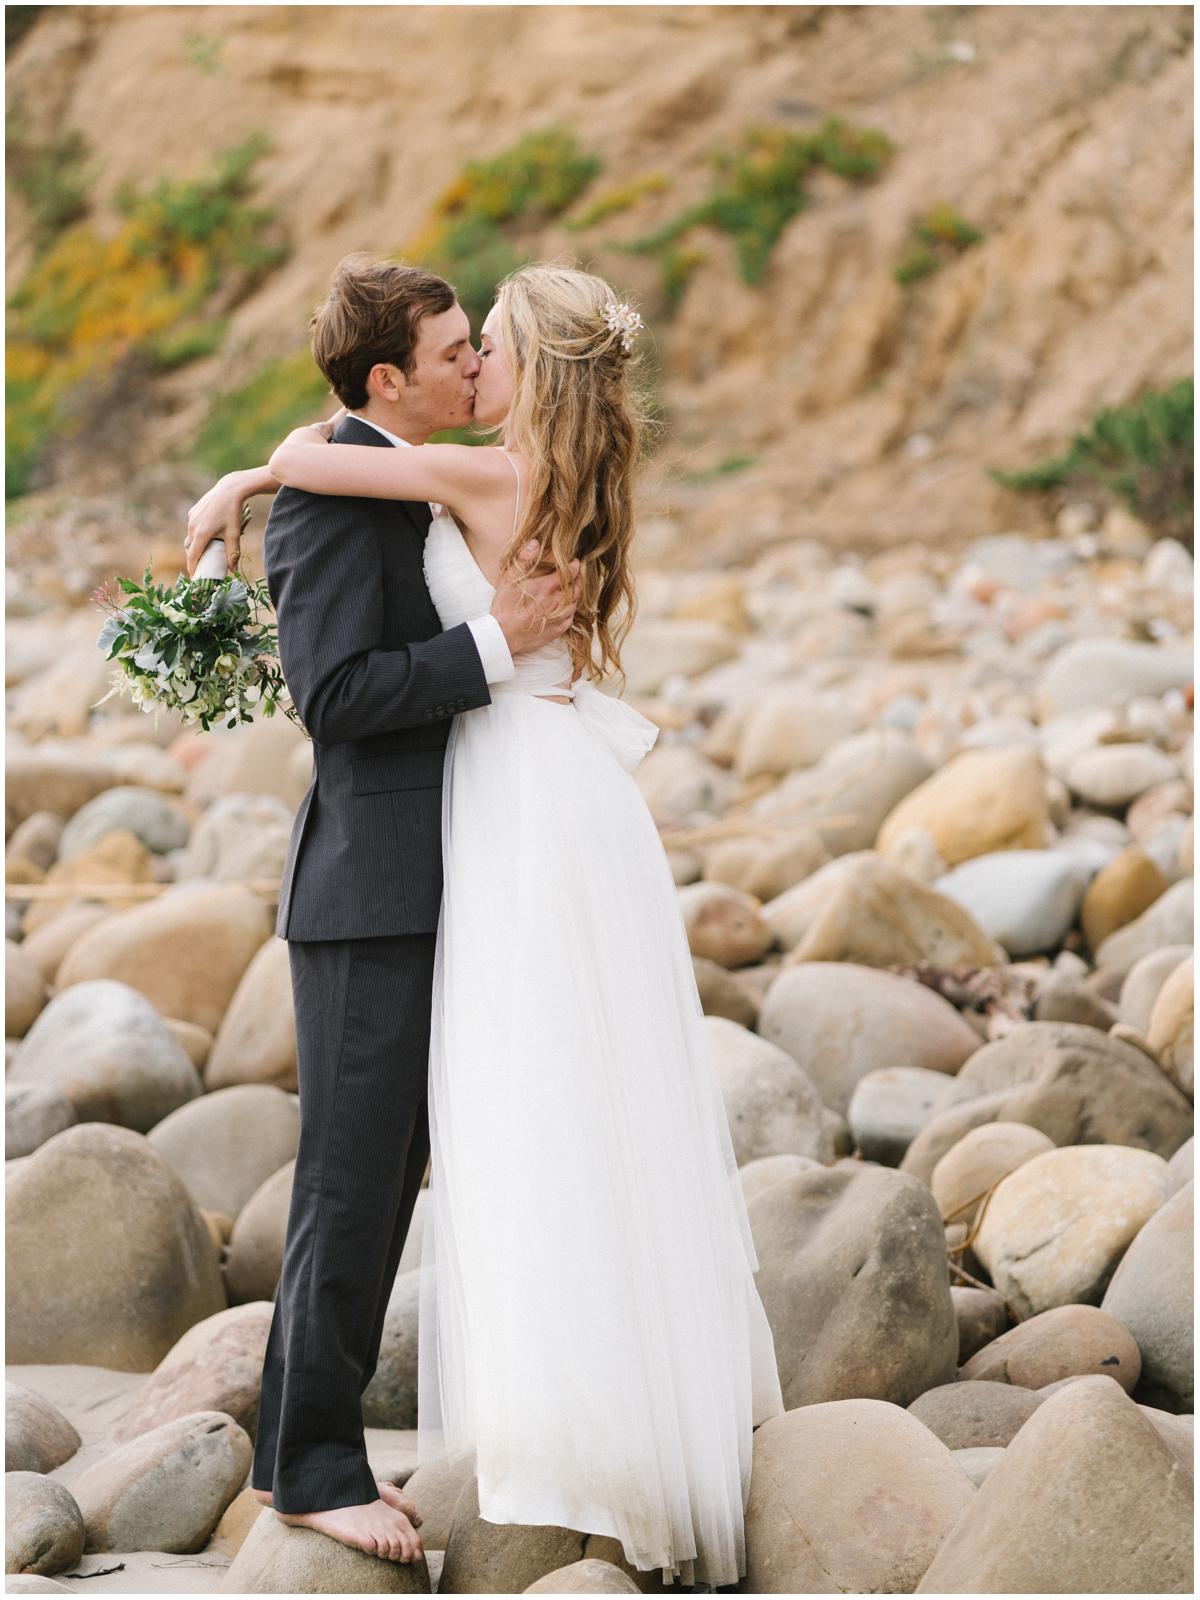 Santa Barbara Elopement Wedding Photographer - Pinnel Photography-23.jpg